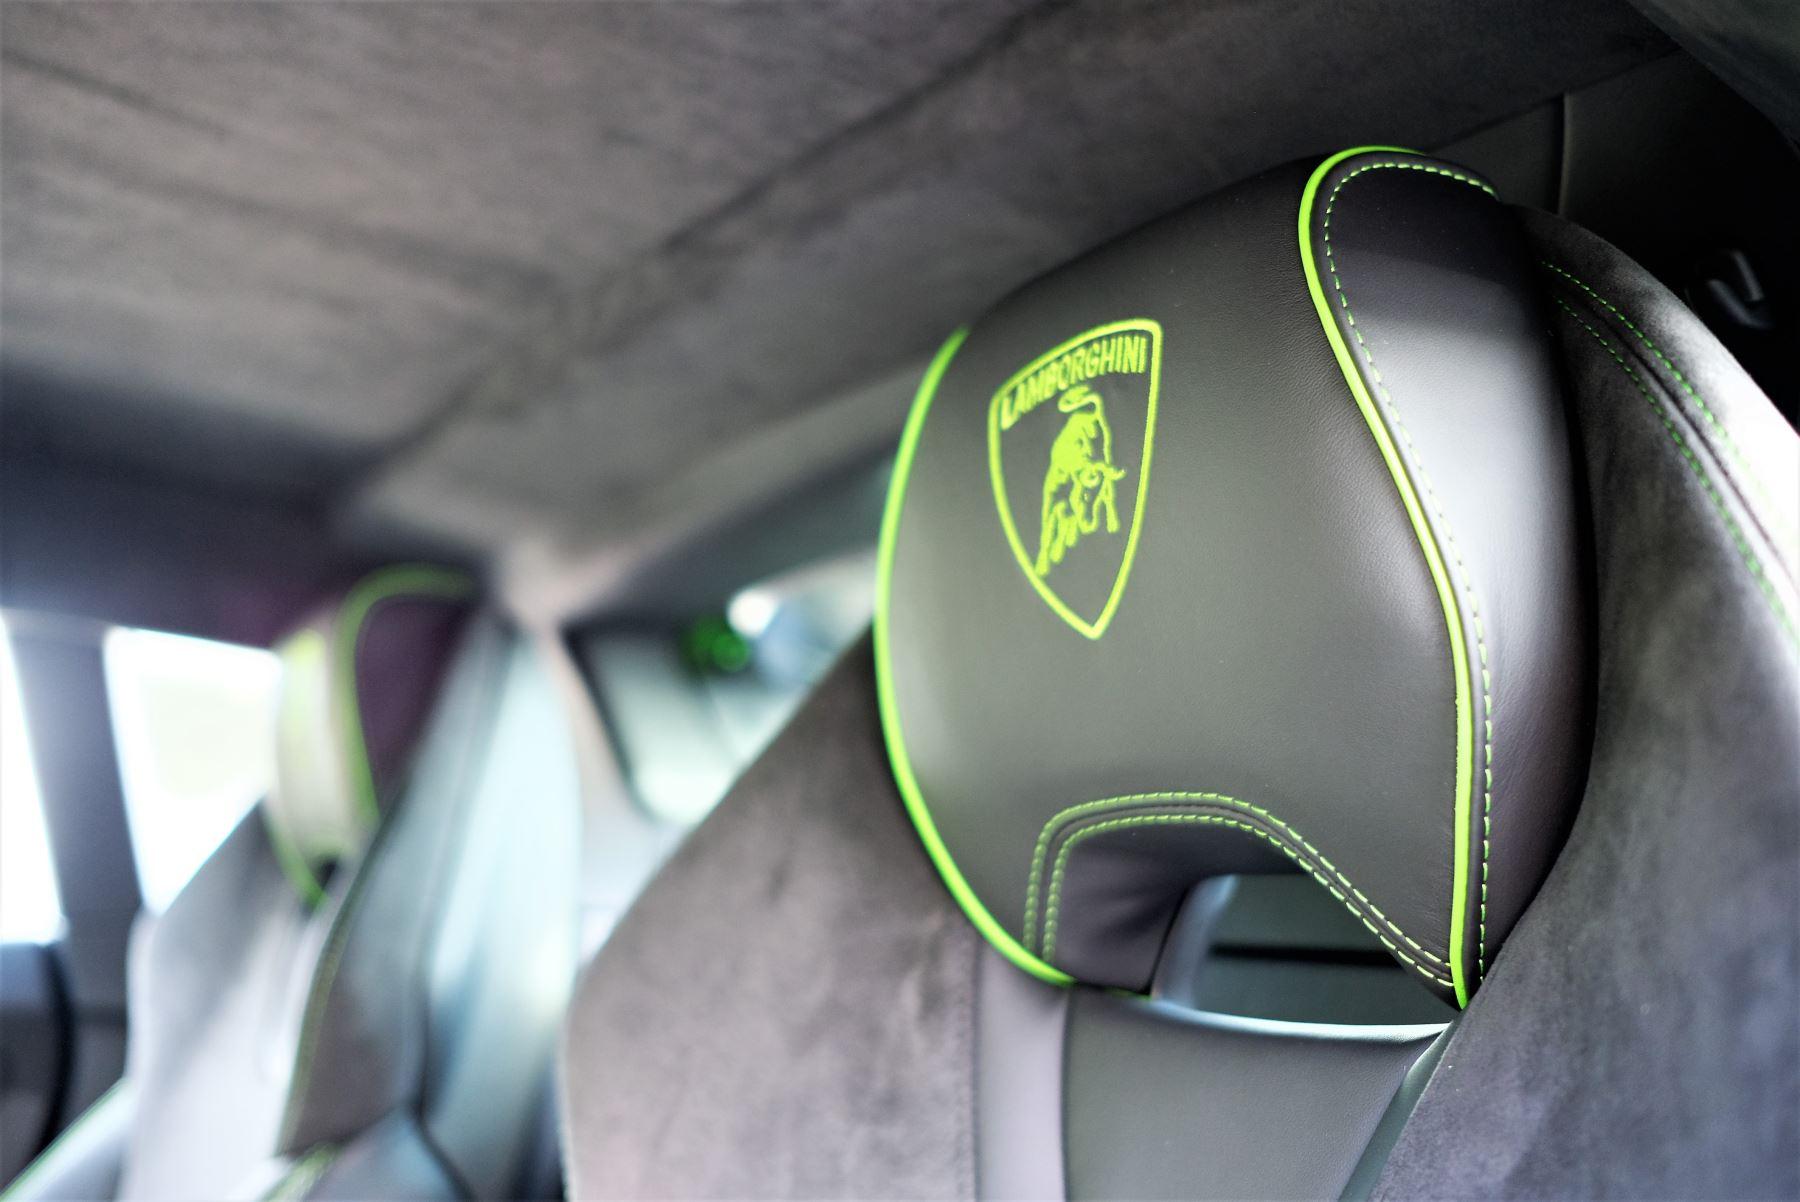 Lamborghini Huracan EVO 5.2 V10 640 2dr Auto AWD image 10